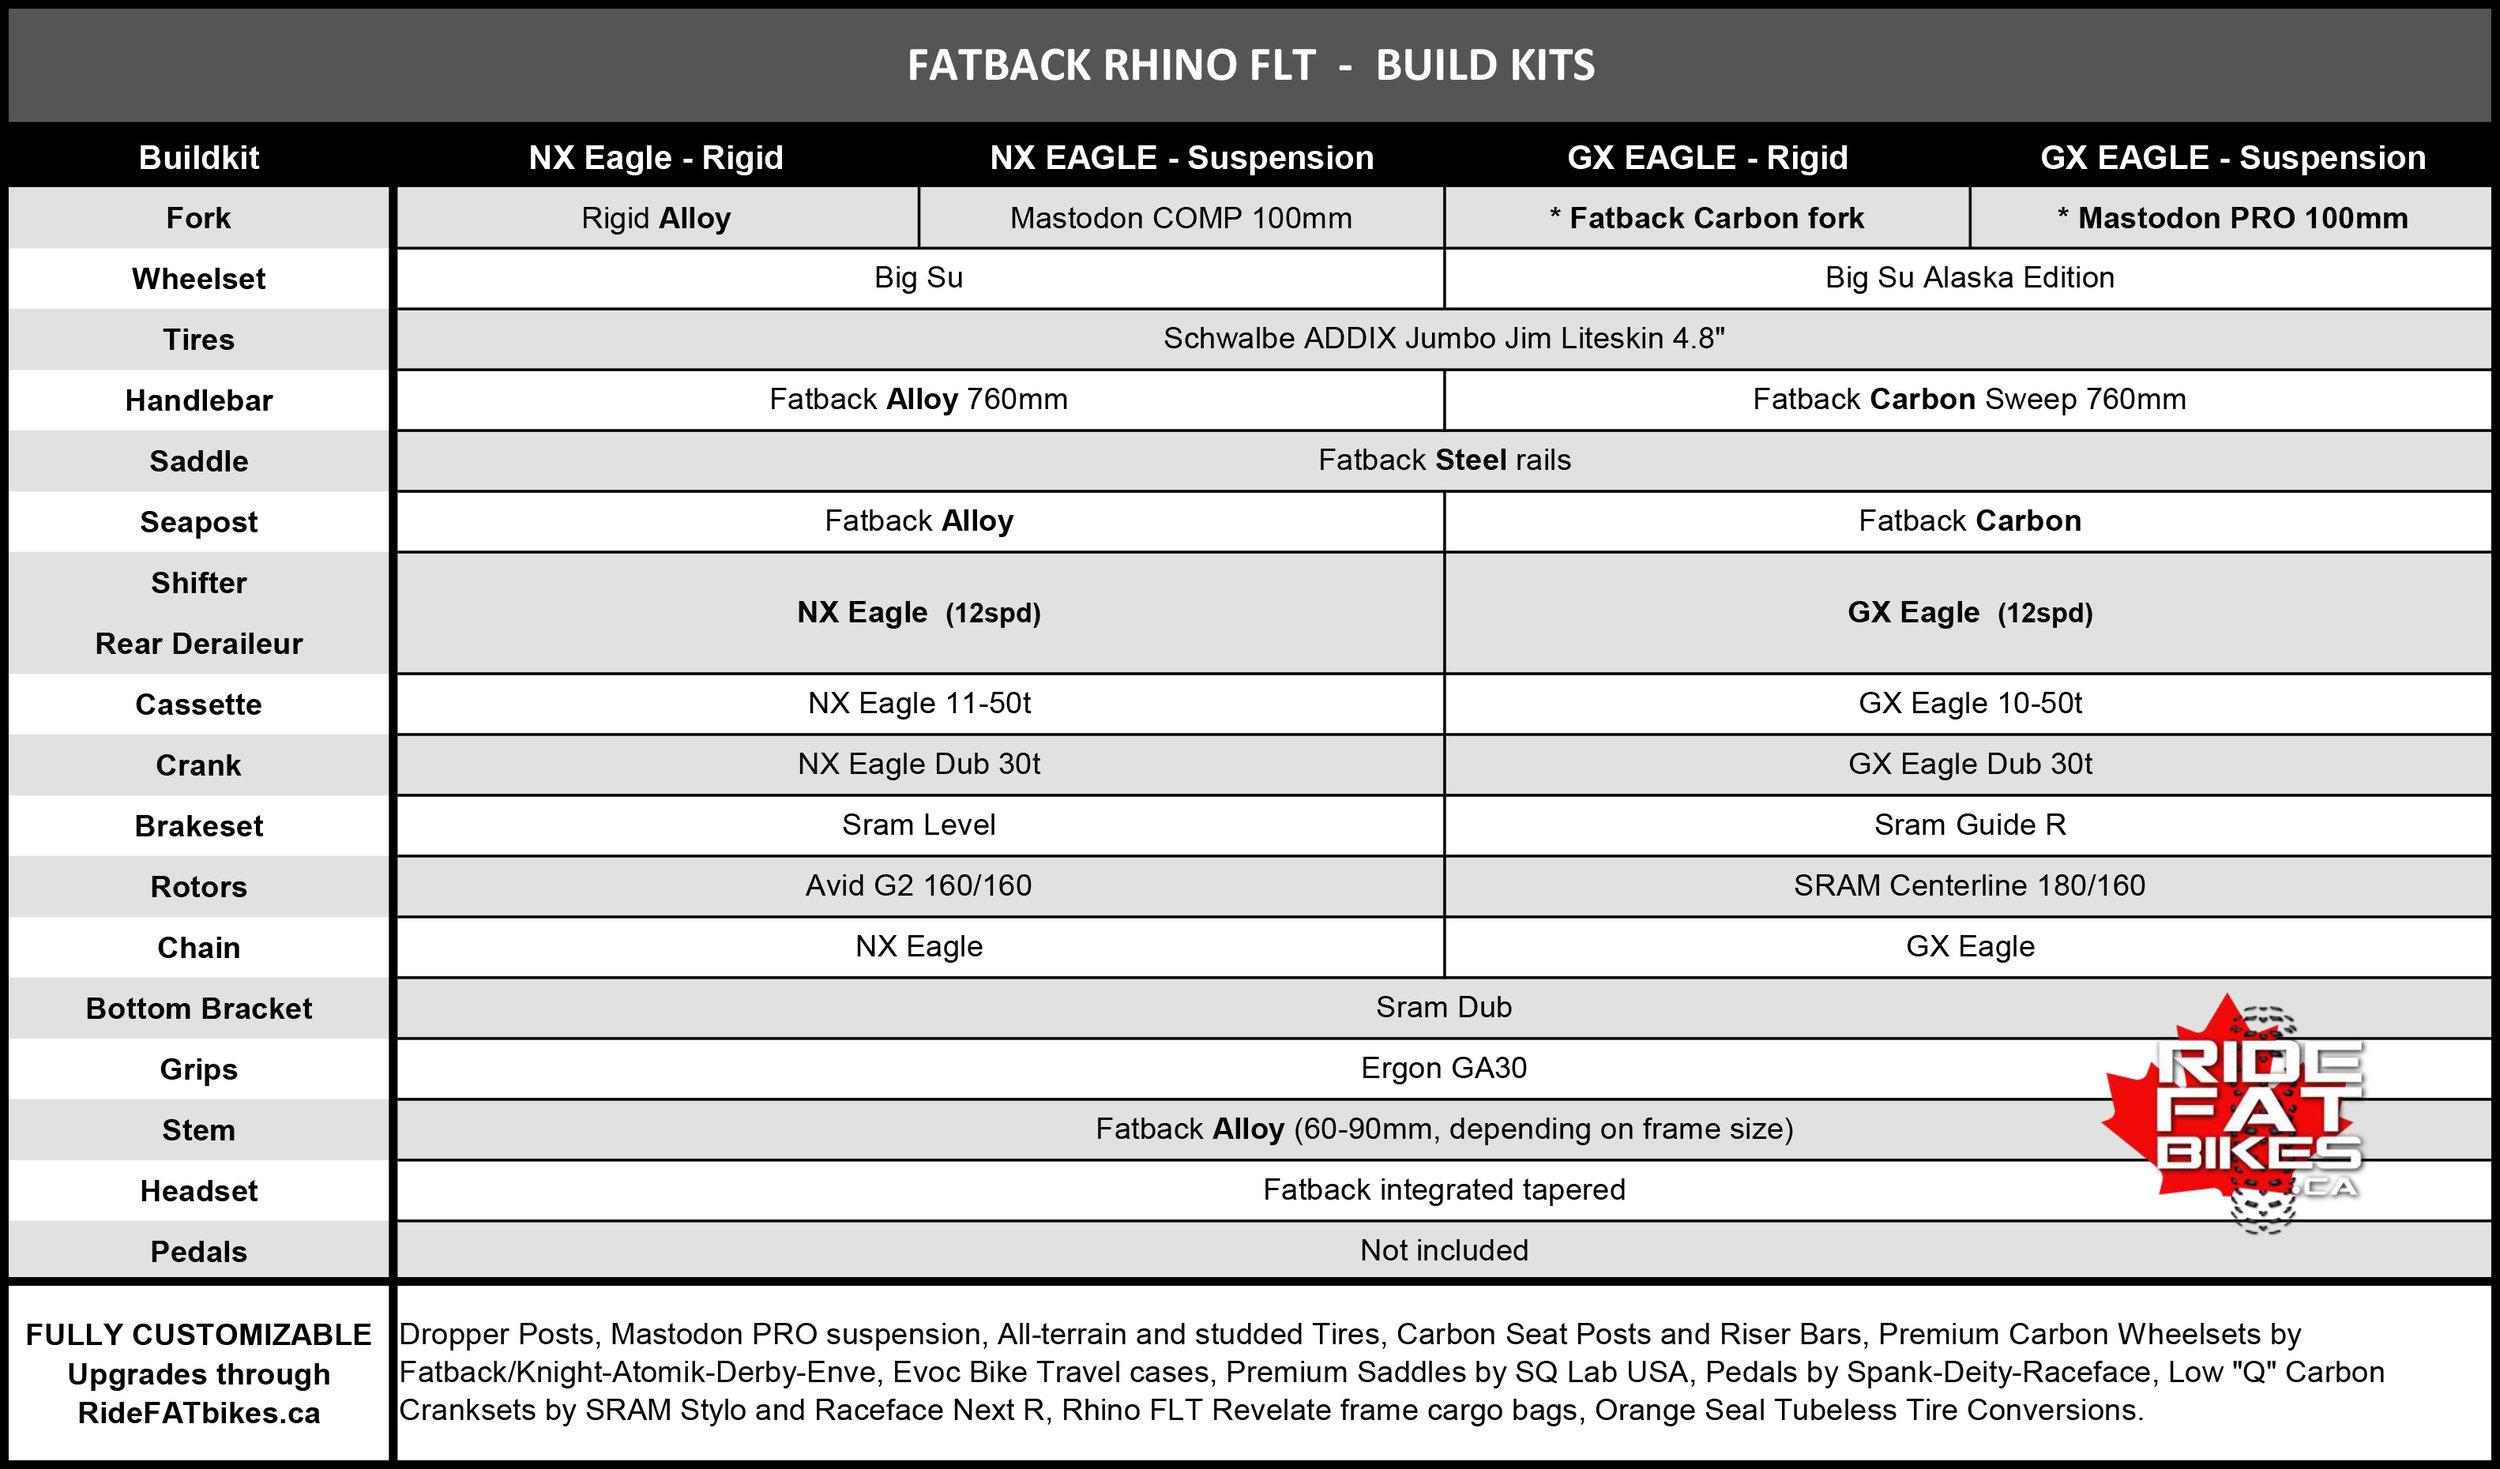 WINTER 2019 - FATBACK RHINO FLT Build kits - RideFATbikes.ca - Fatbiking in Canada